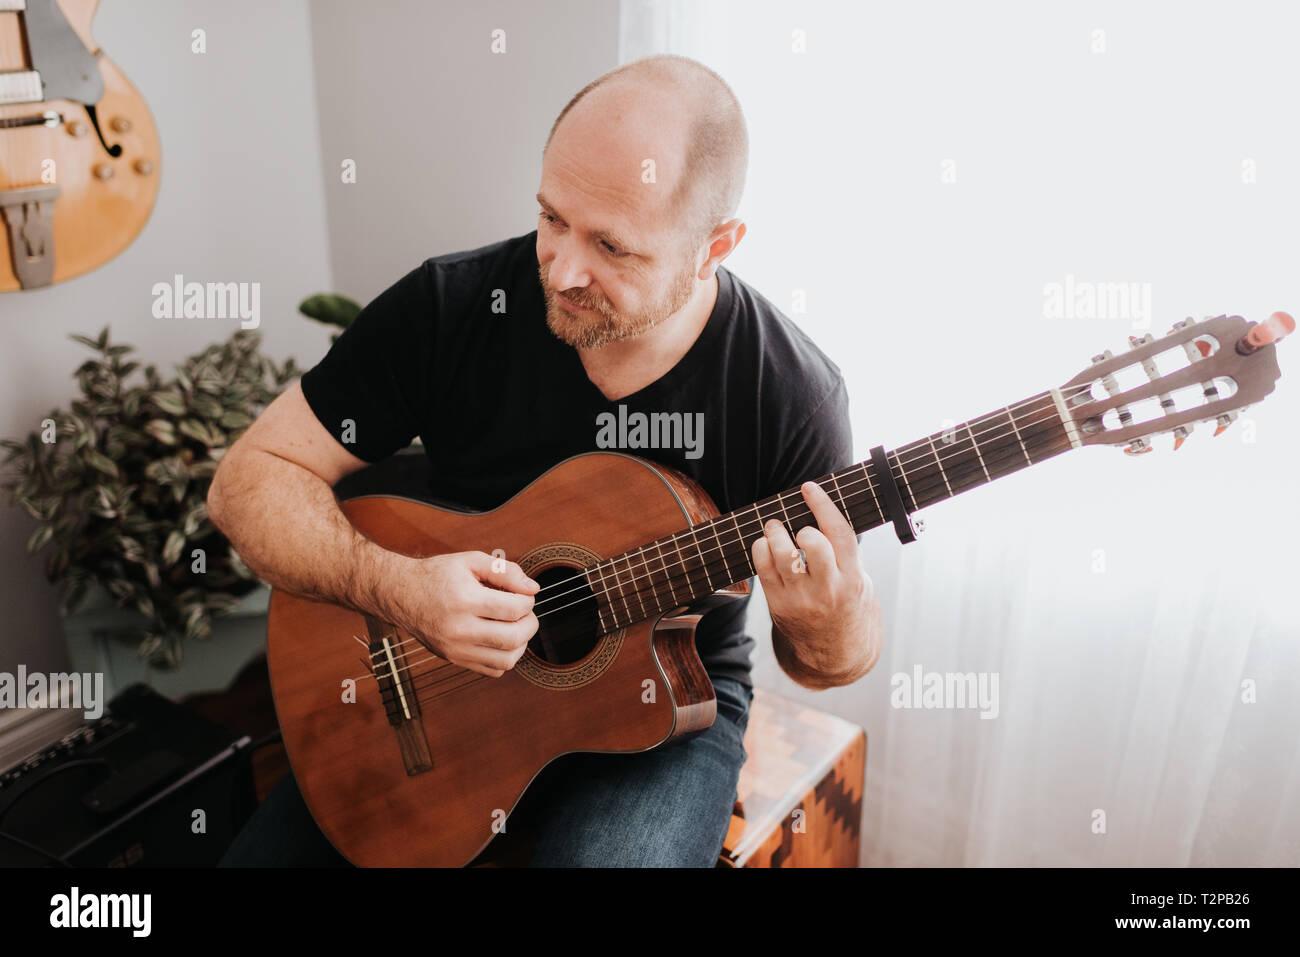 Man playing guitar at home - Stock Image